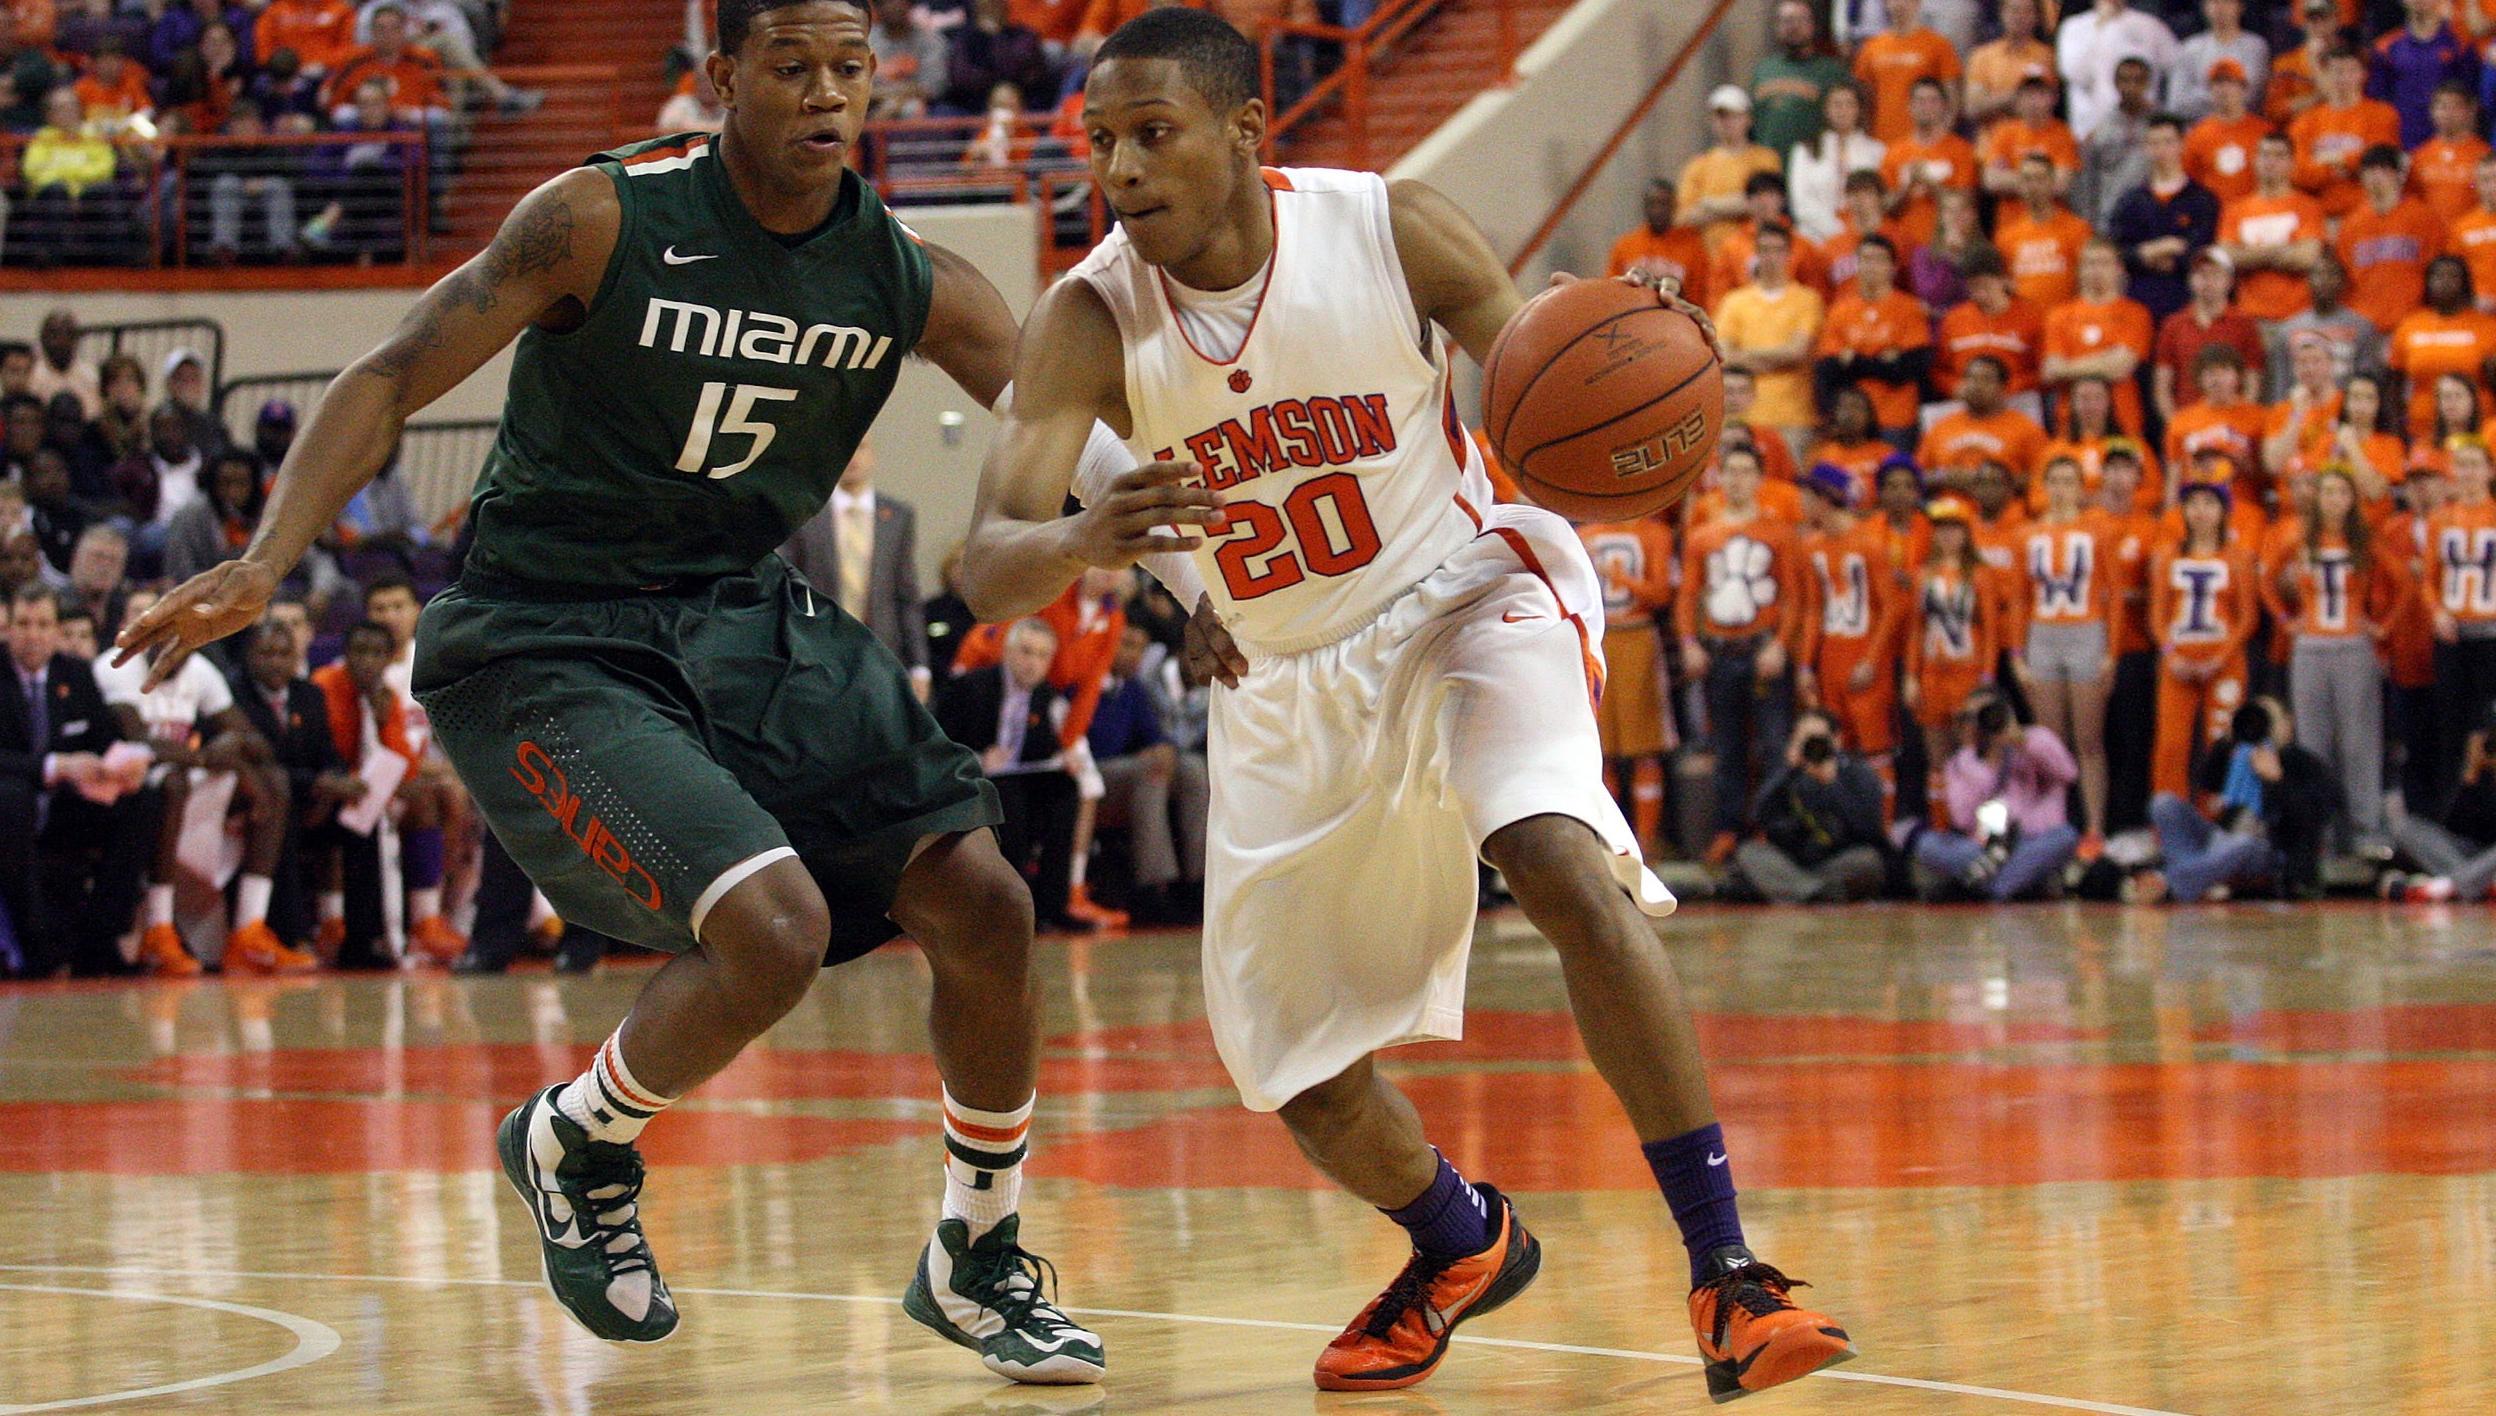 Men's Basketball Game vs. North Carolina Sold Out